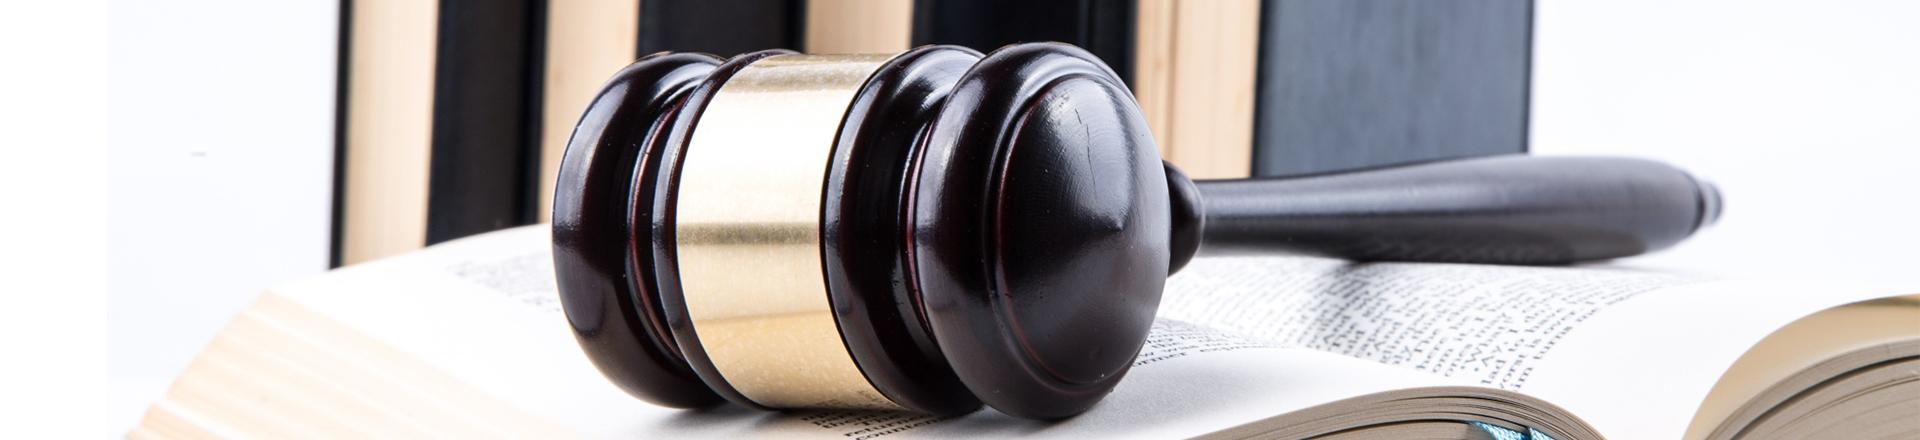 Carlos Haering Lawyers - Civil Law Marbella slide